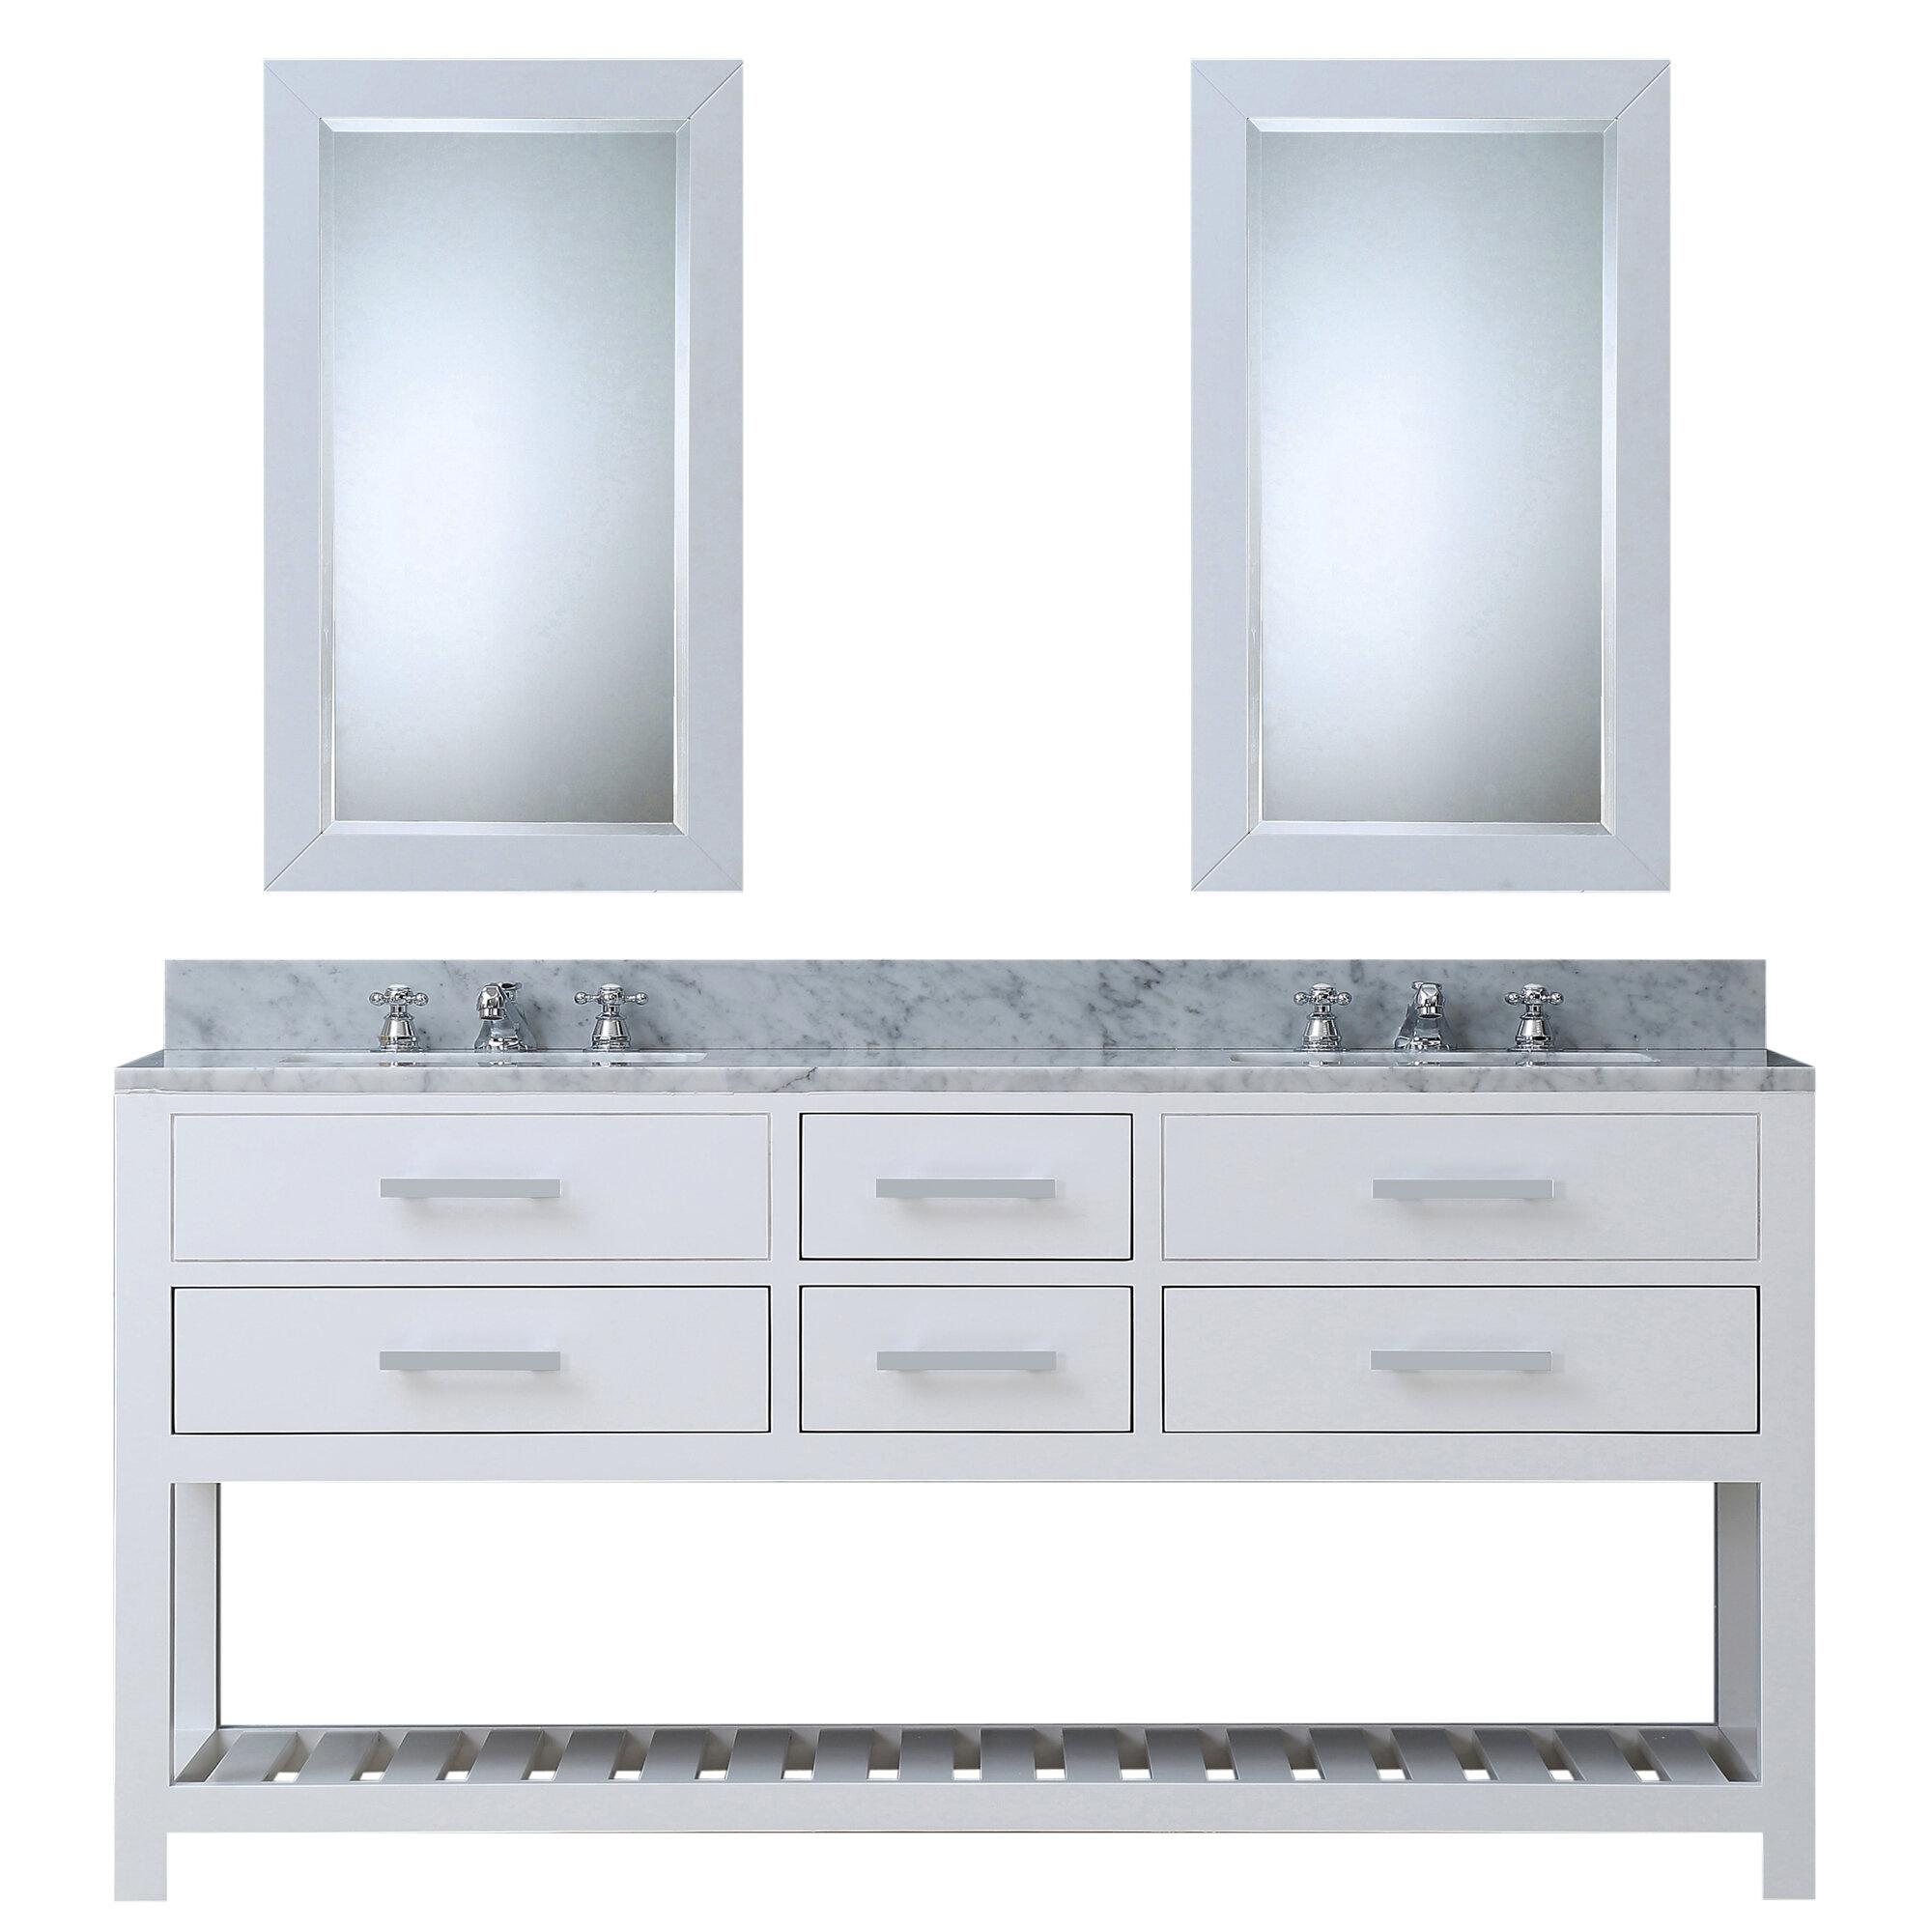 Contemporary Office Interior Design, Perego 72 Double Sink Bathroom Vanity Set With Mirror Reviews Allmodern